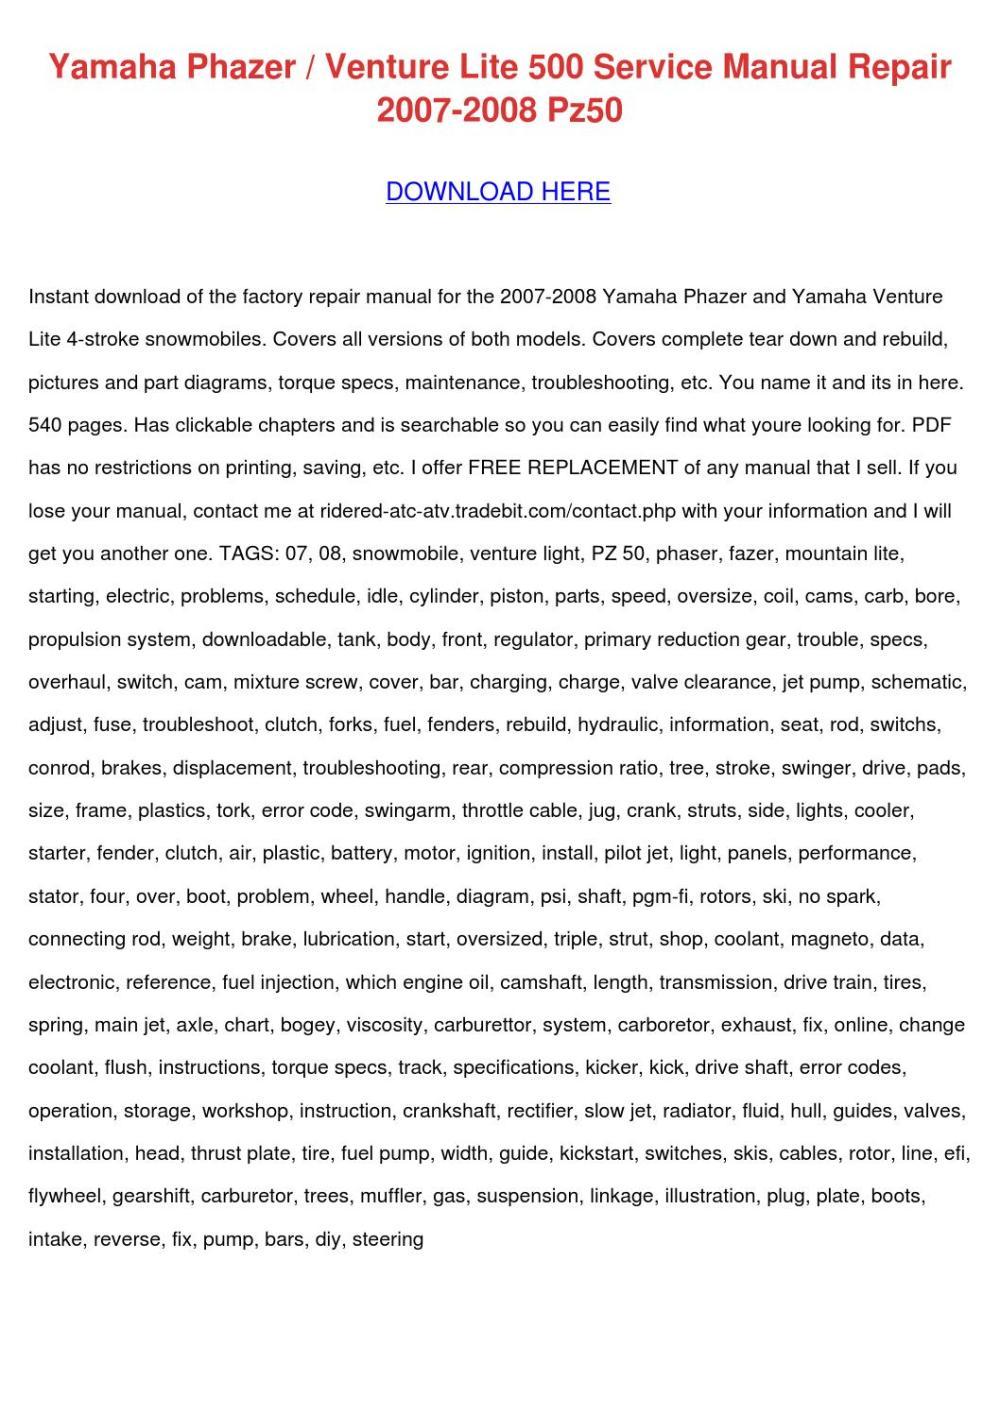 medium resolution of yamaha phazer venture lite 500 service manual